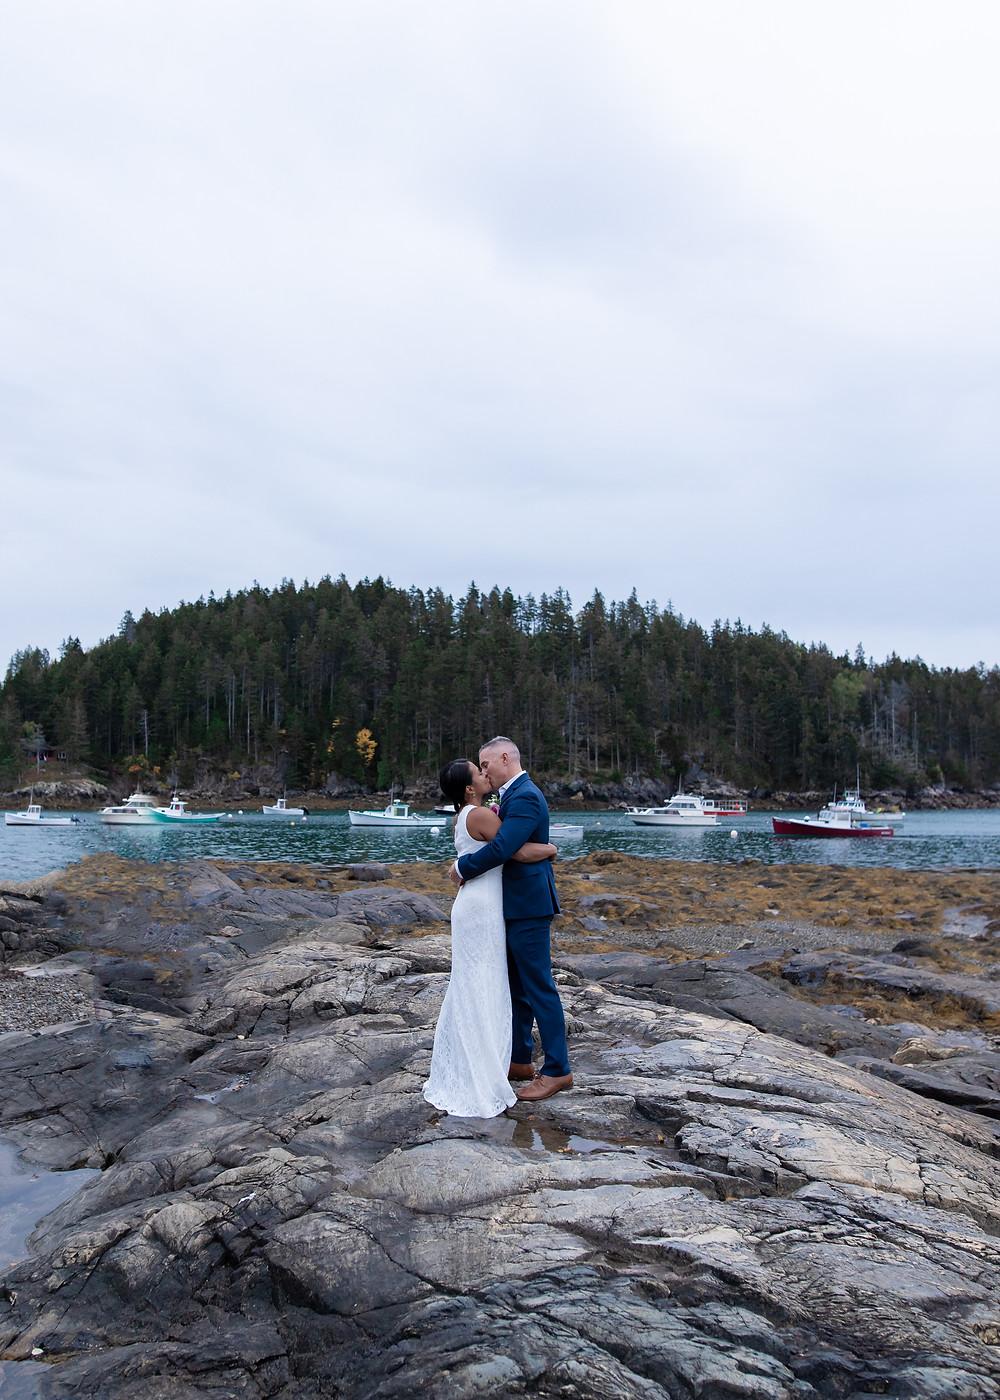 Elopement photographer in Maine